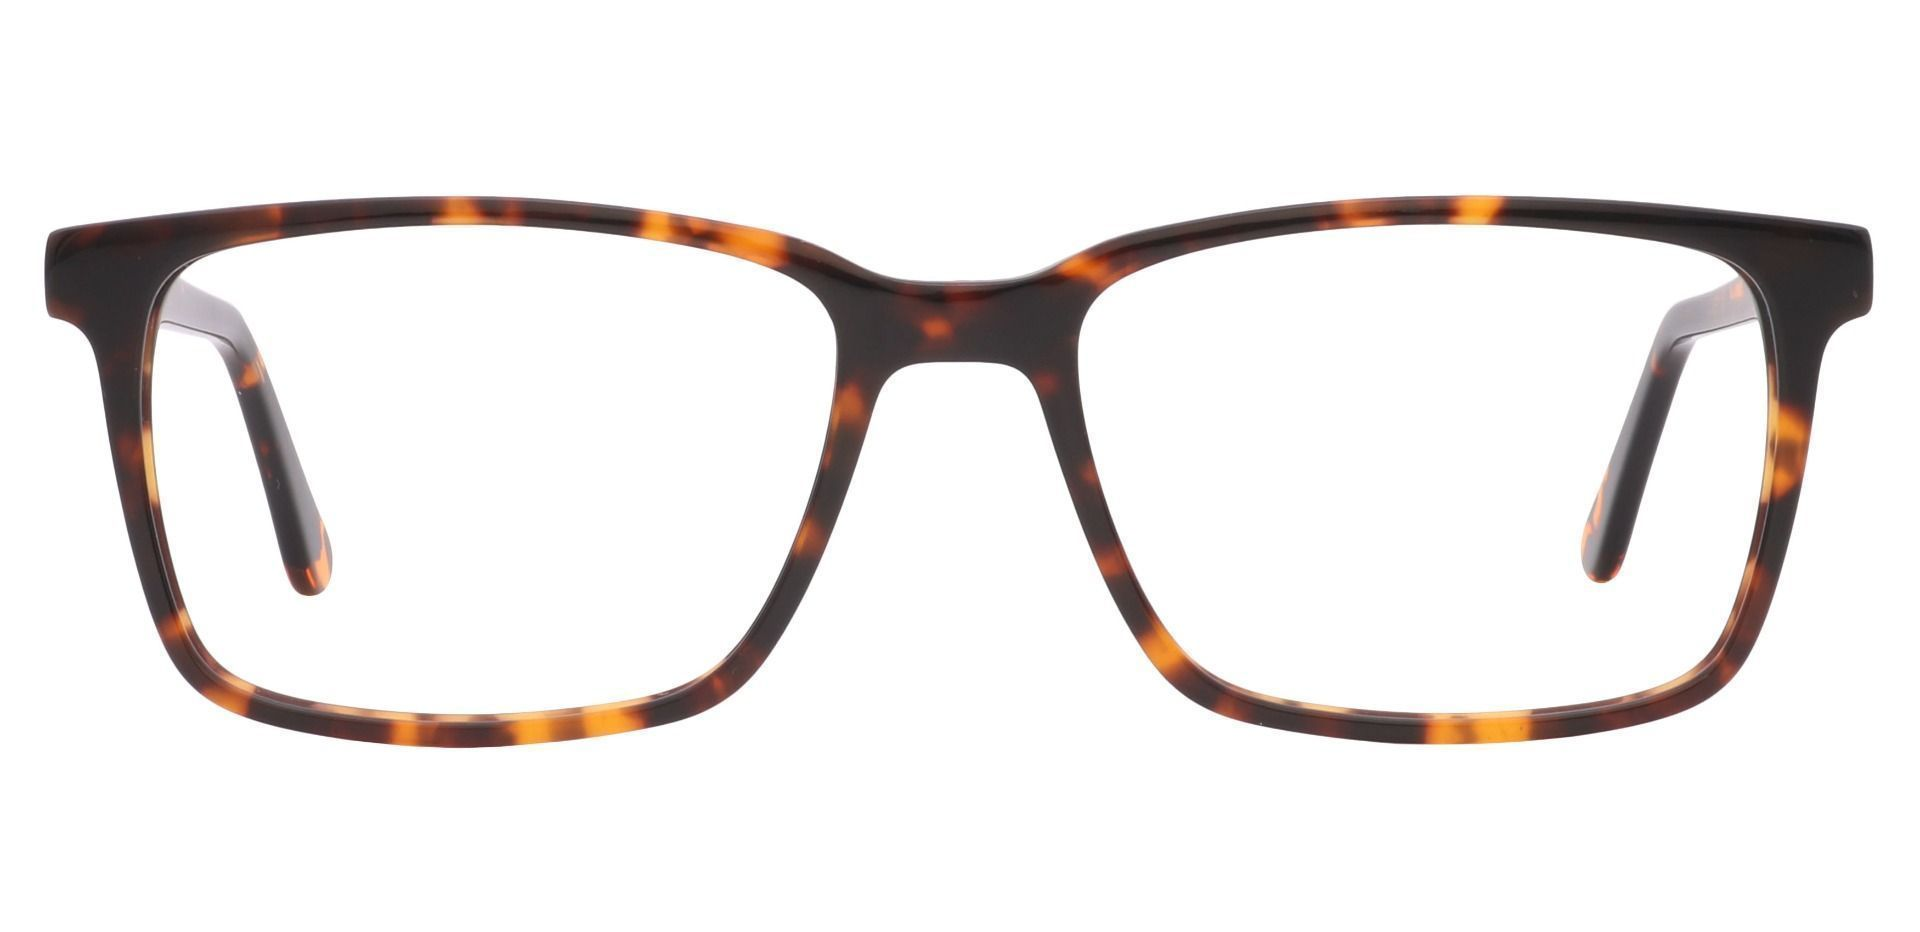 Venice Rectangle Non-Rx Glasses - Tortoise